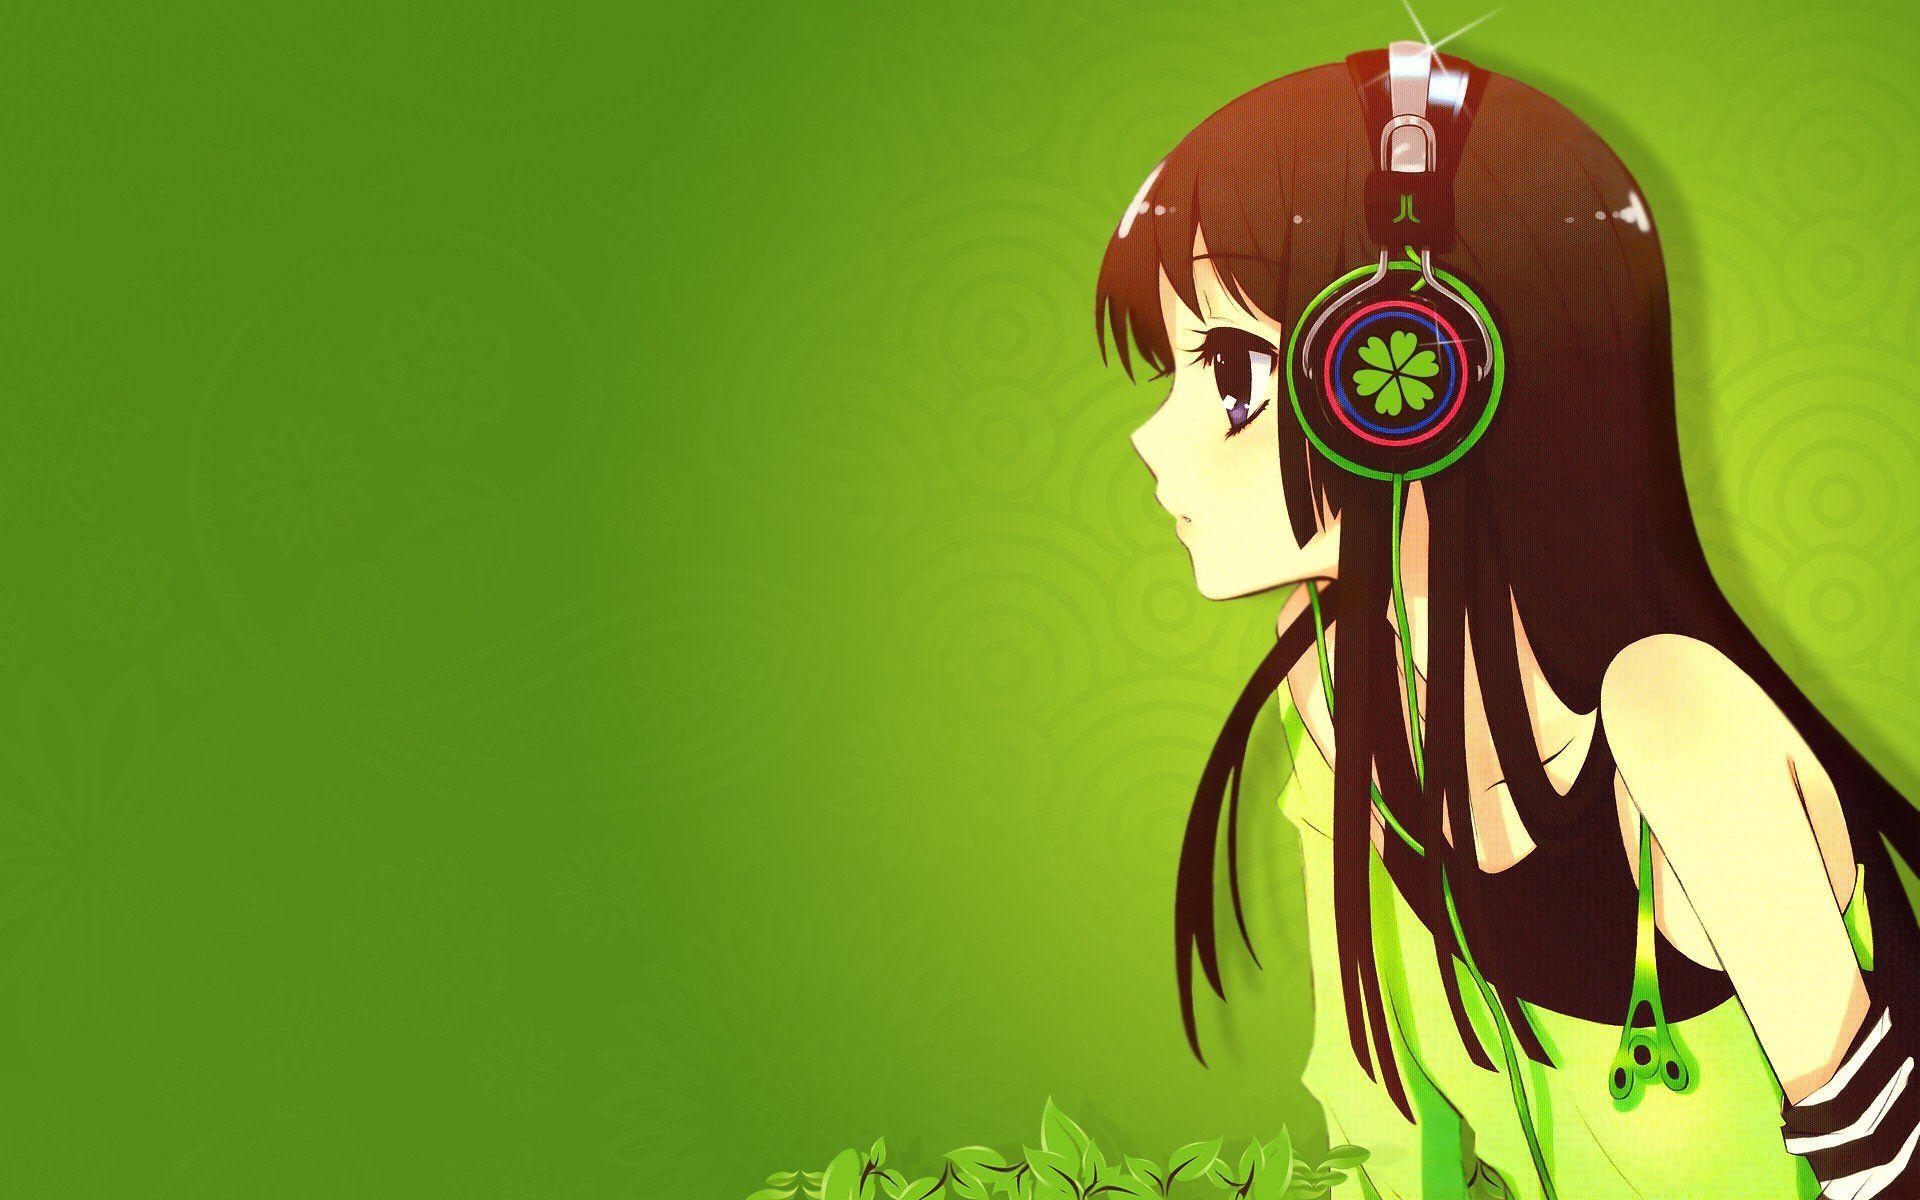 Cute anime girl with headphones wallpaper hd cute anime